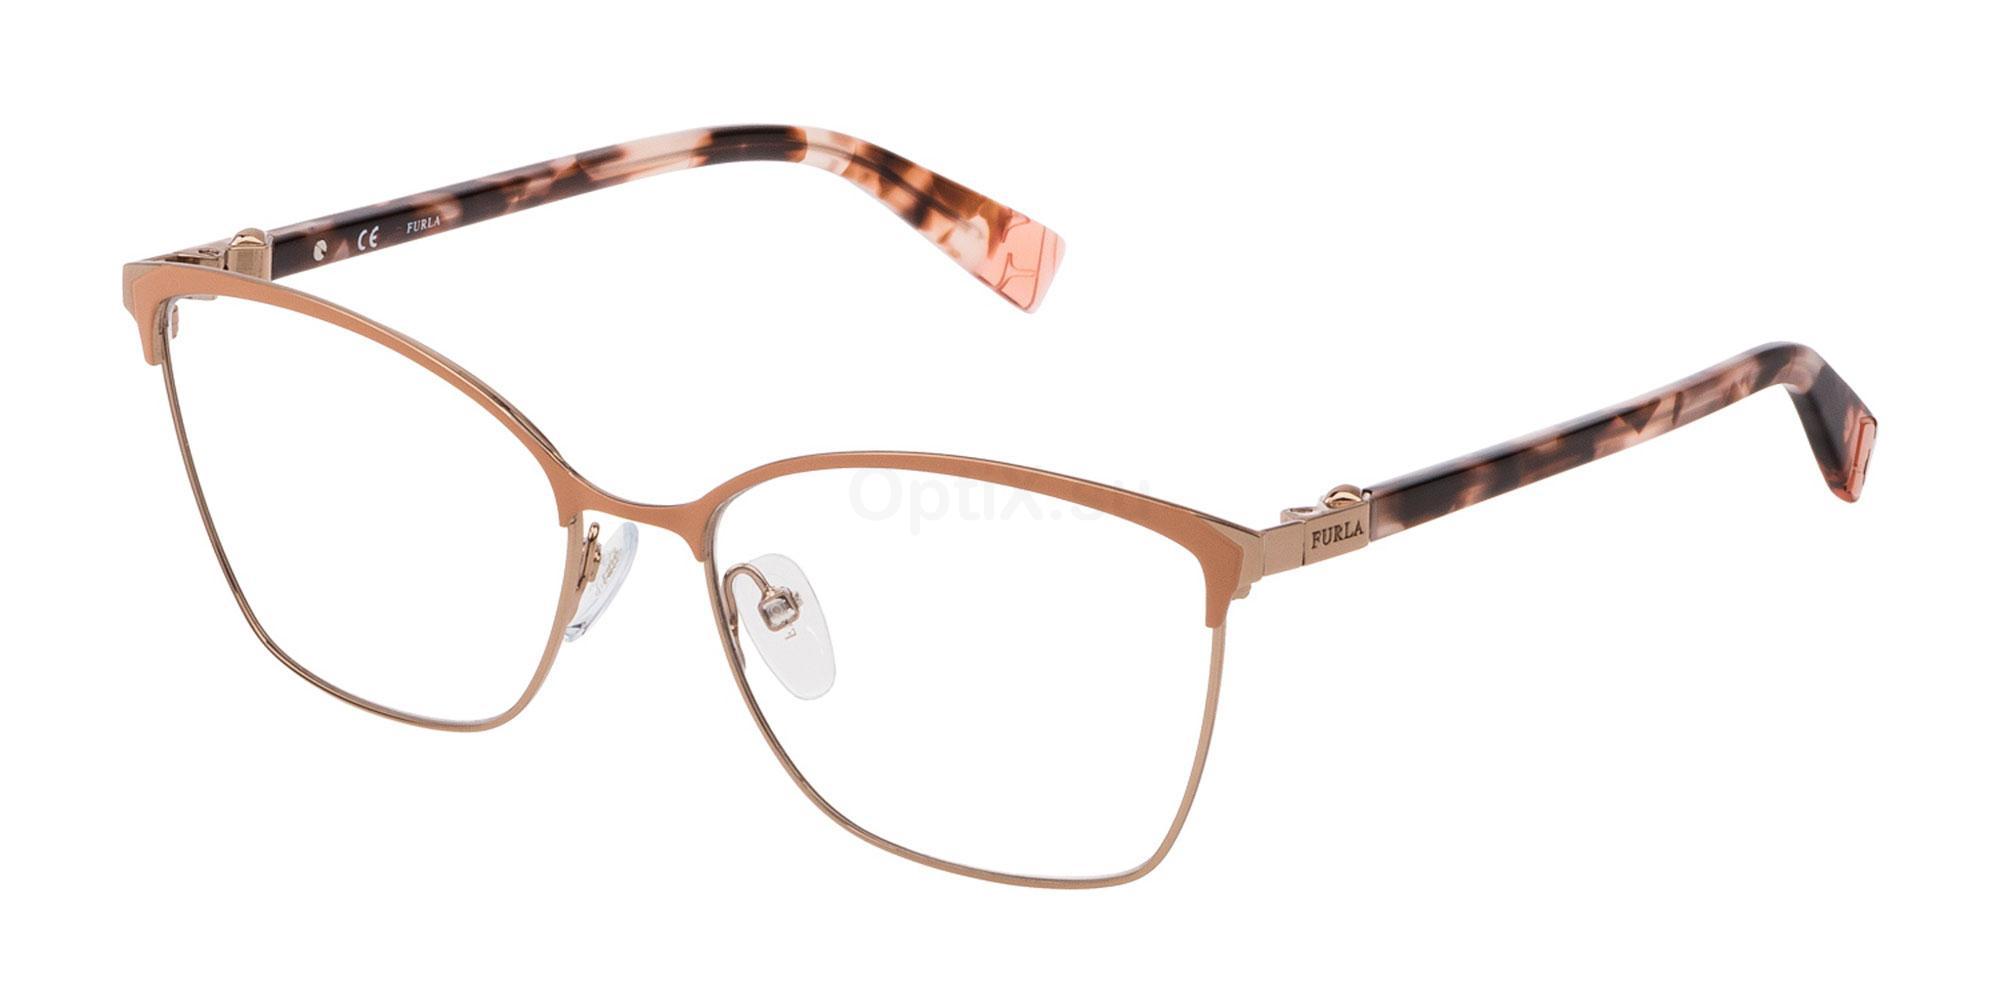 08M6 VFU296 Glasses, Furla